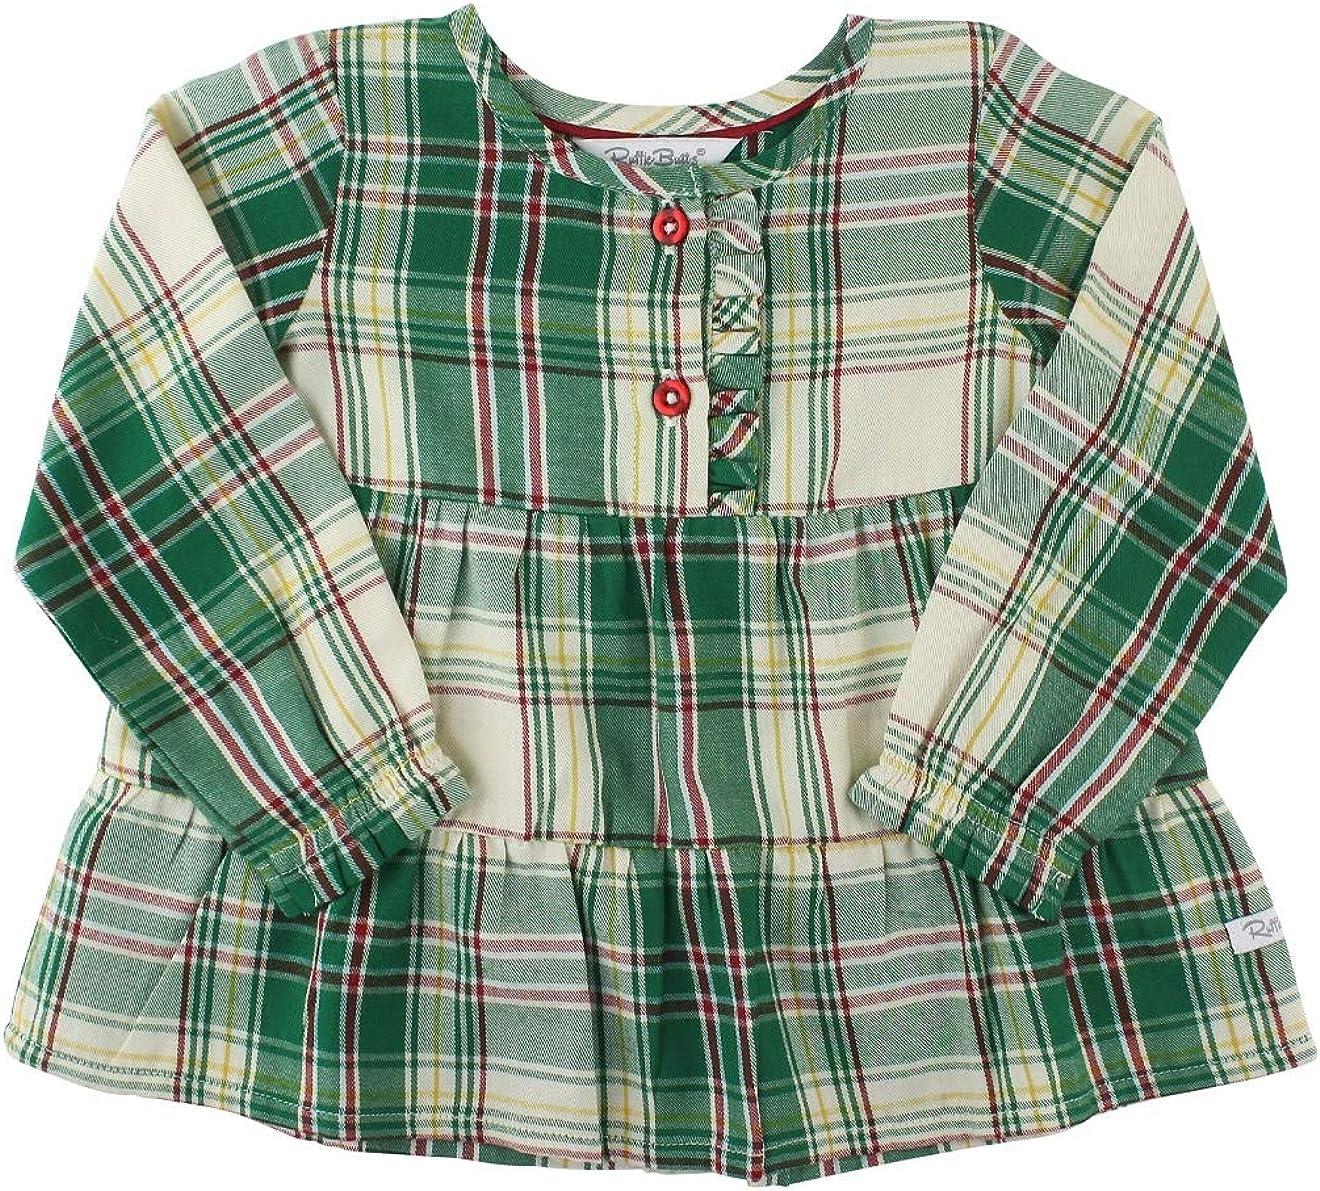 RuffleButts Baby/Toddler Girls Tiered Henley Top